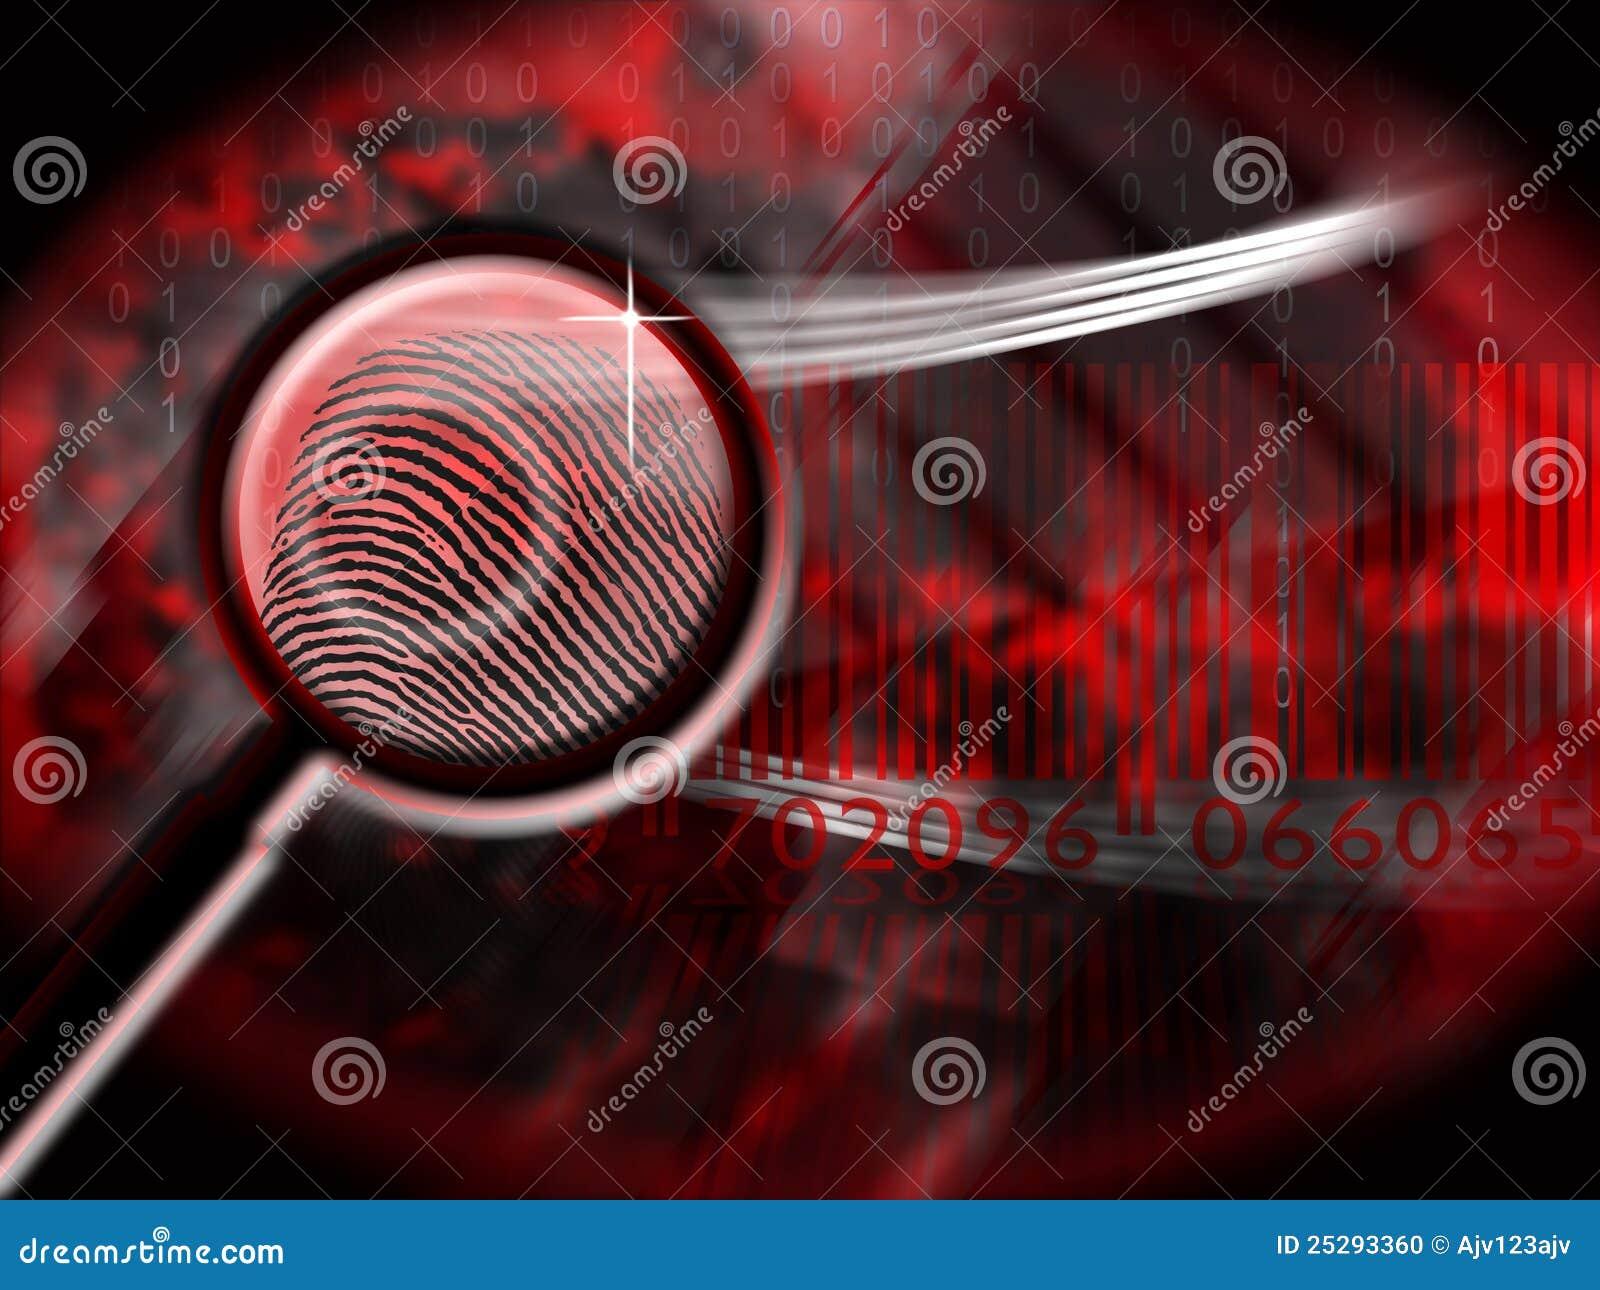 Thumb print crime